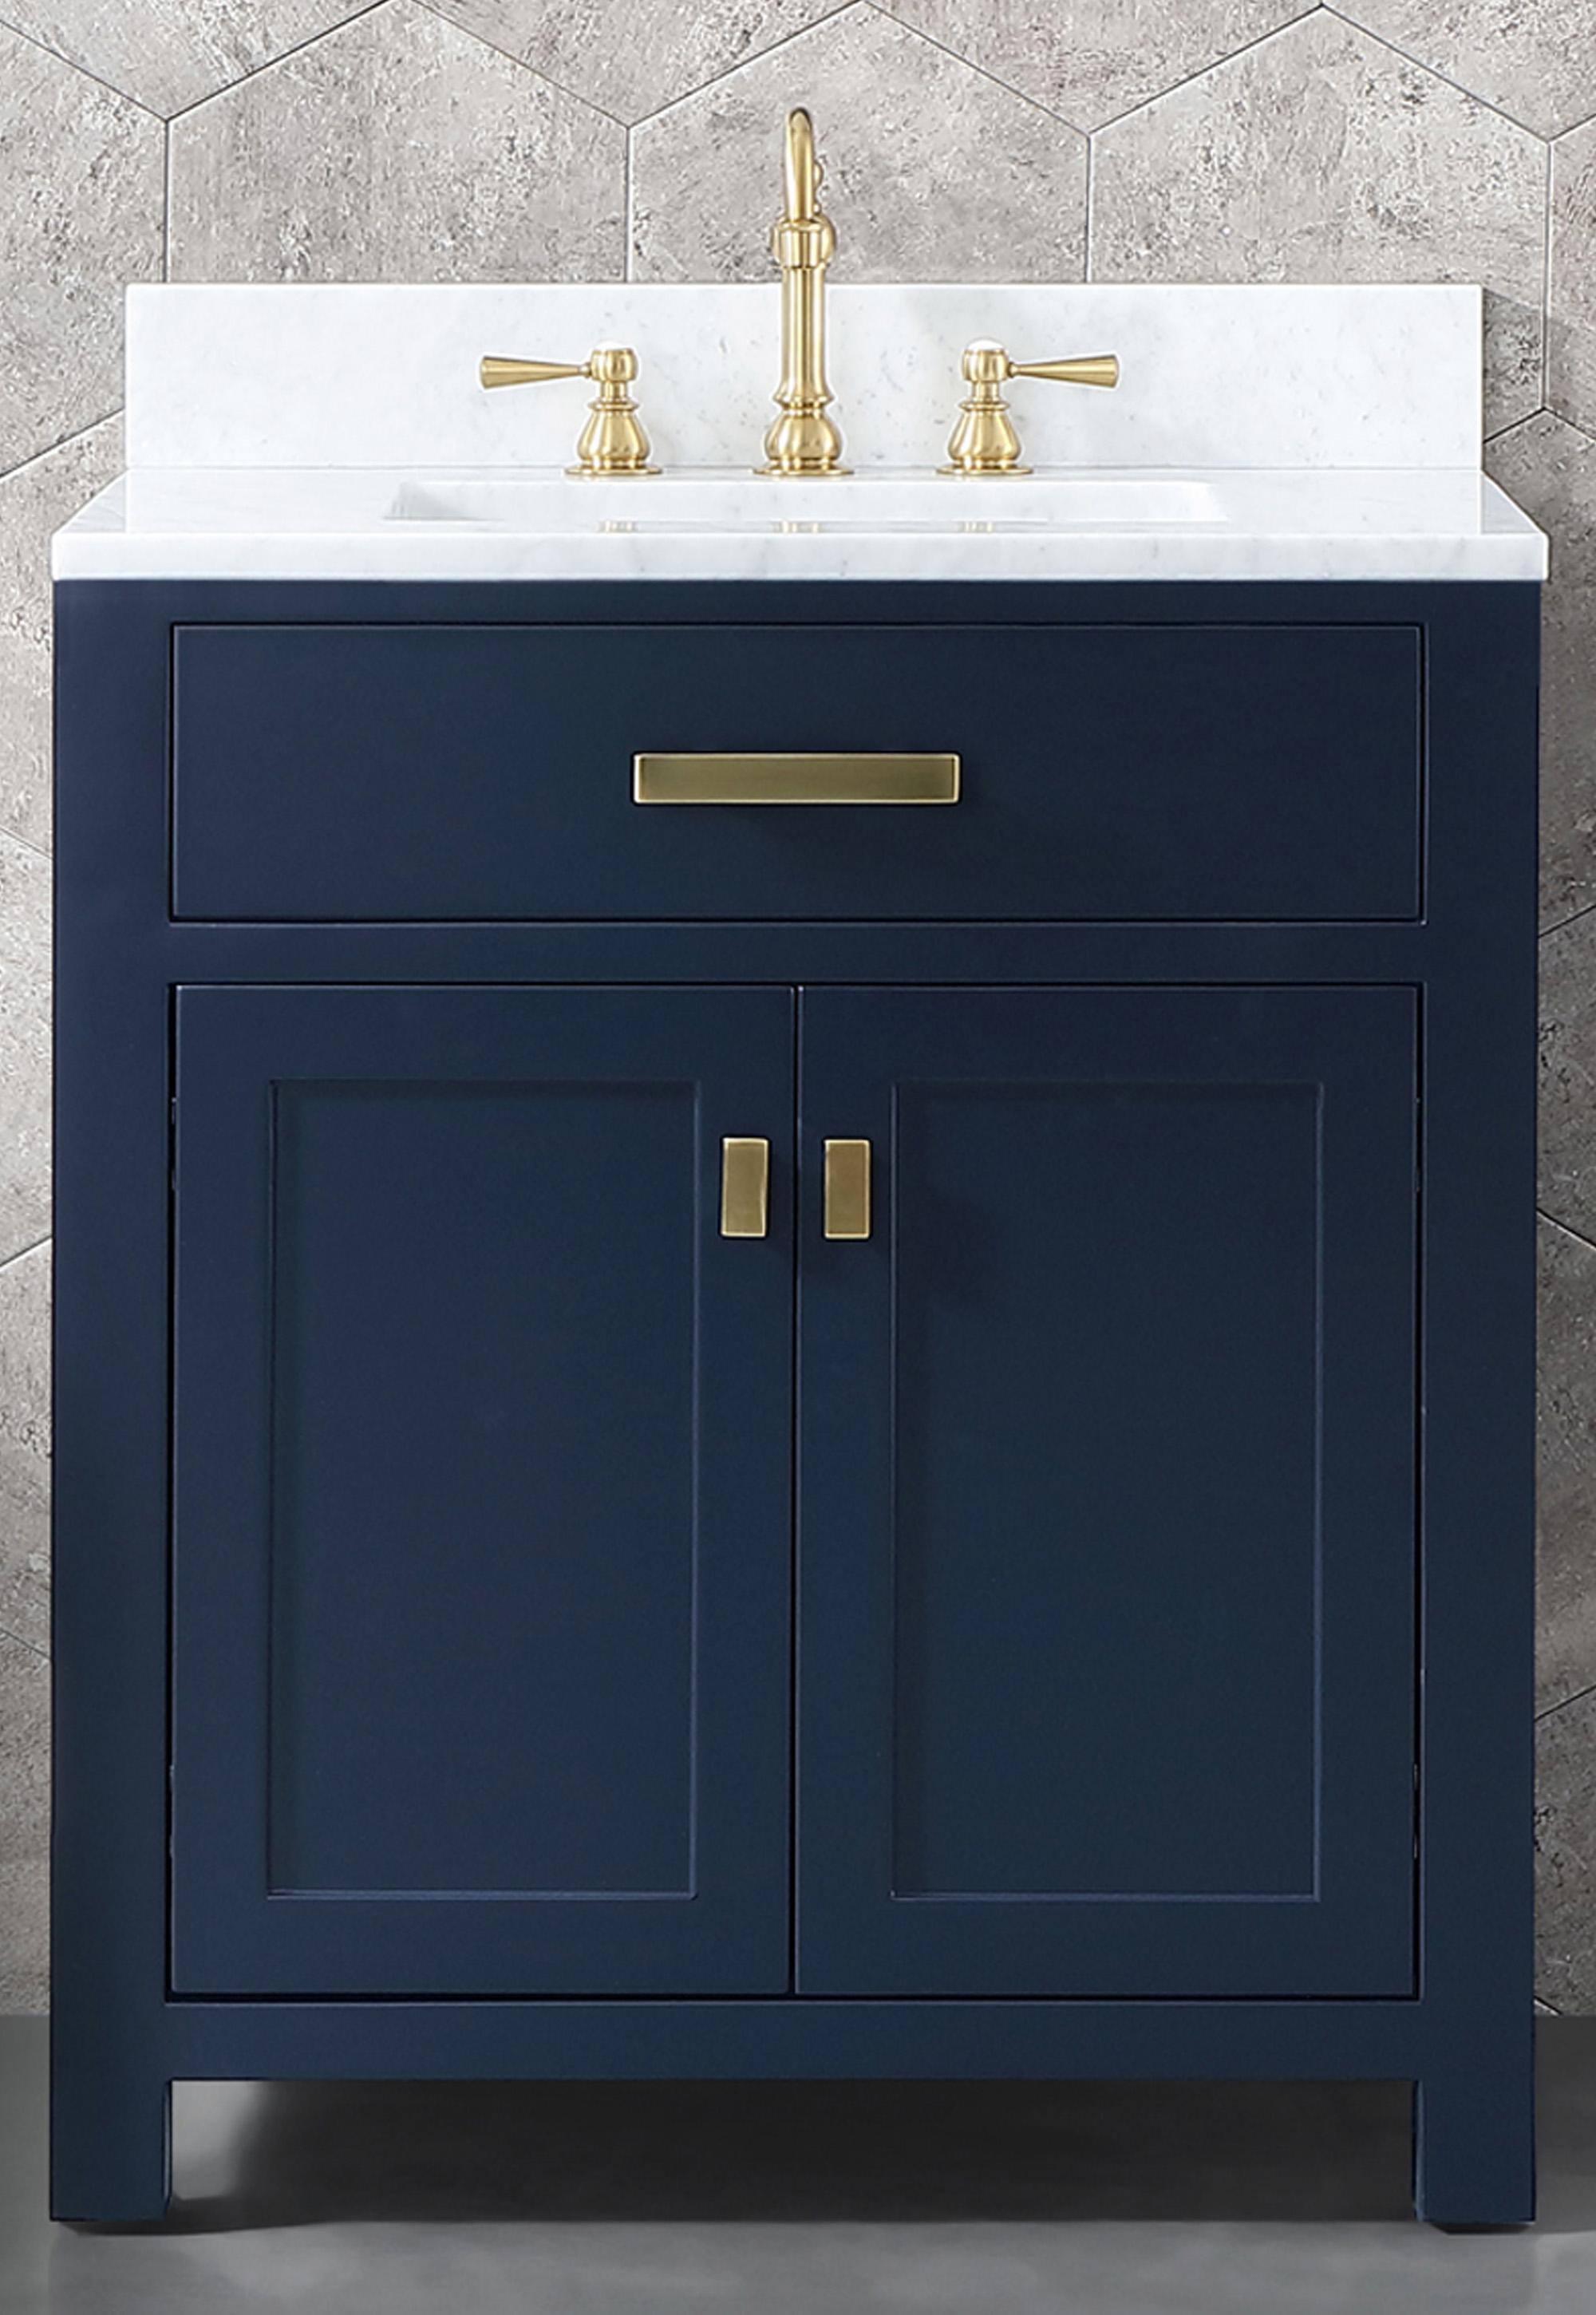 "30"" Single Sink Carrara White Marble Vanity In Monarch Blue Color"